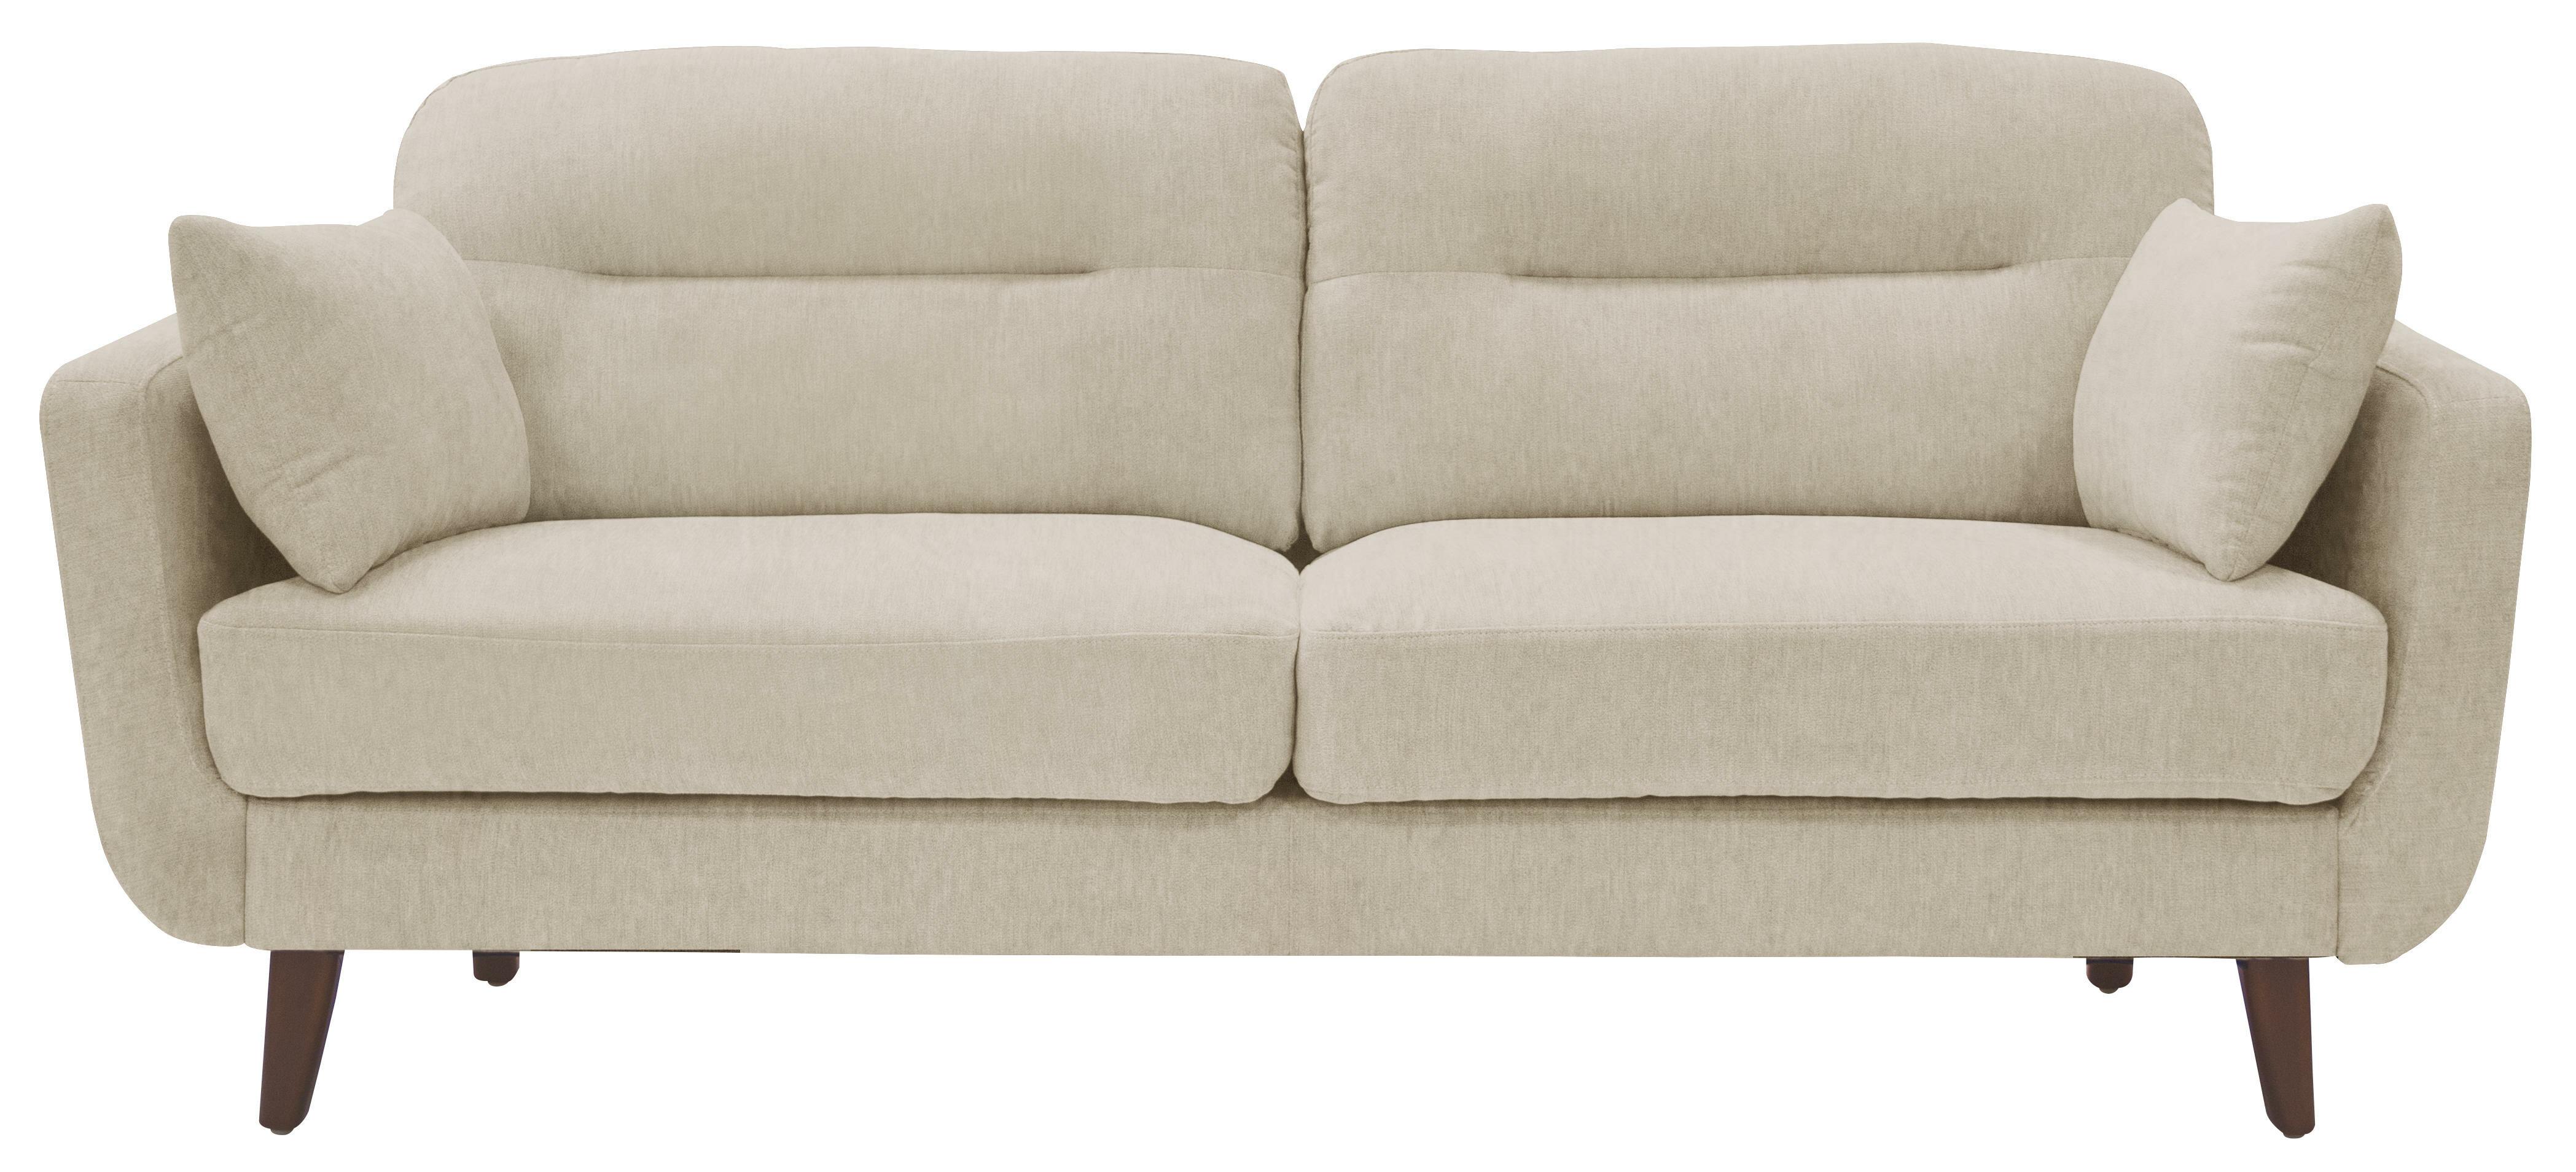 Astounding Elle Decor Chloe Mid Century Modern Sofa Reviews Wayfair Bralicious Painted Fabric Chair Ideas Braliciousco